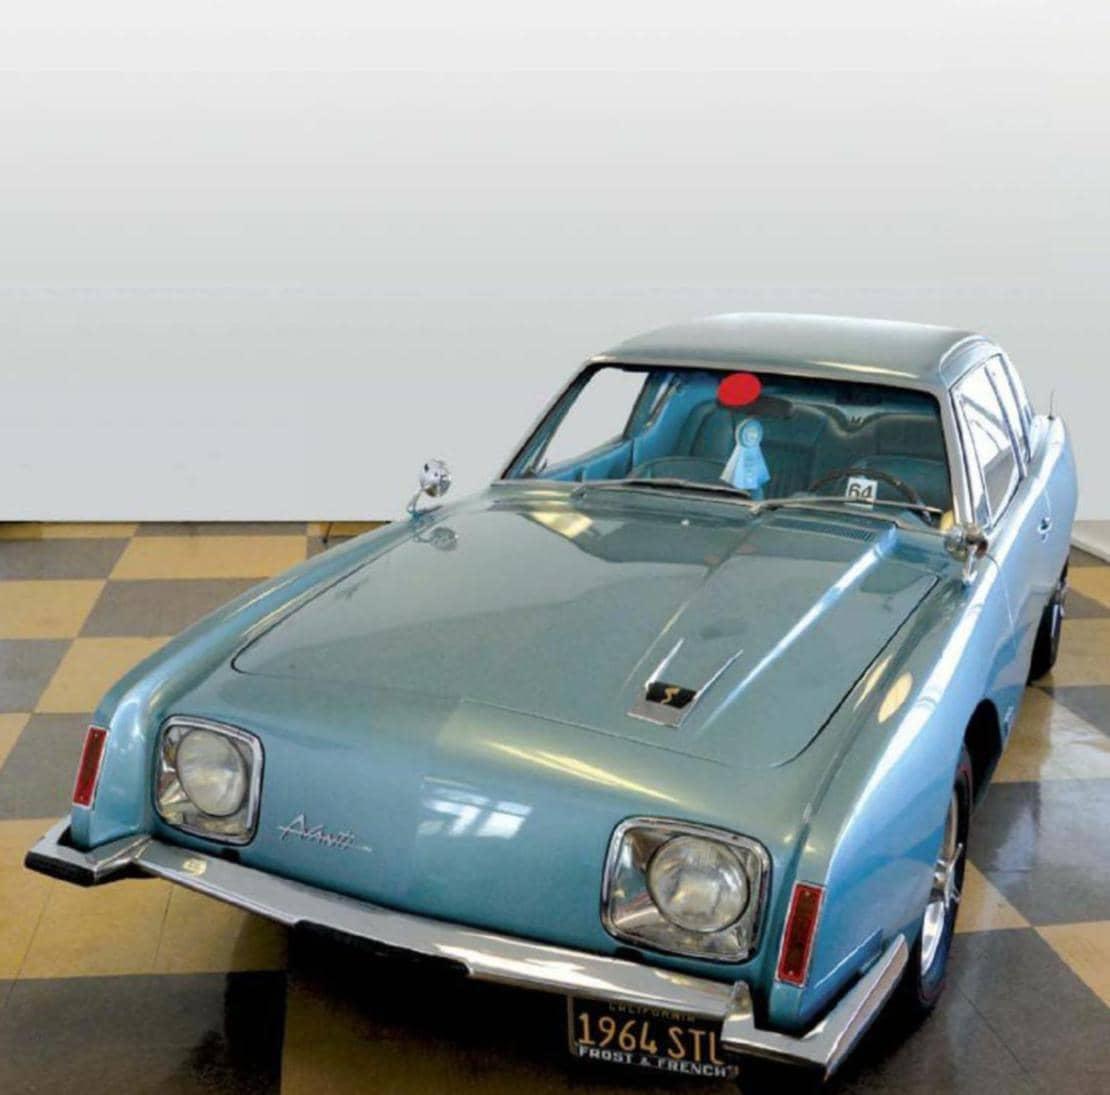 GET TO KNOW: The Studebaker Avanti